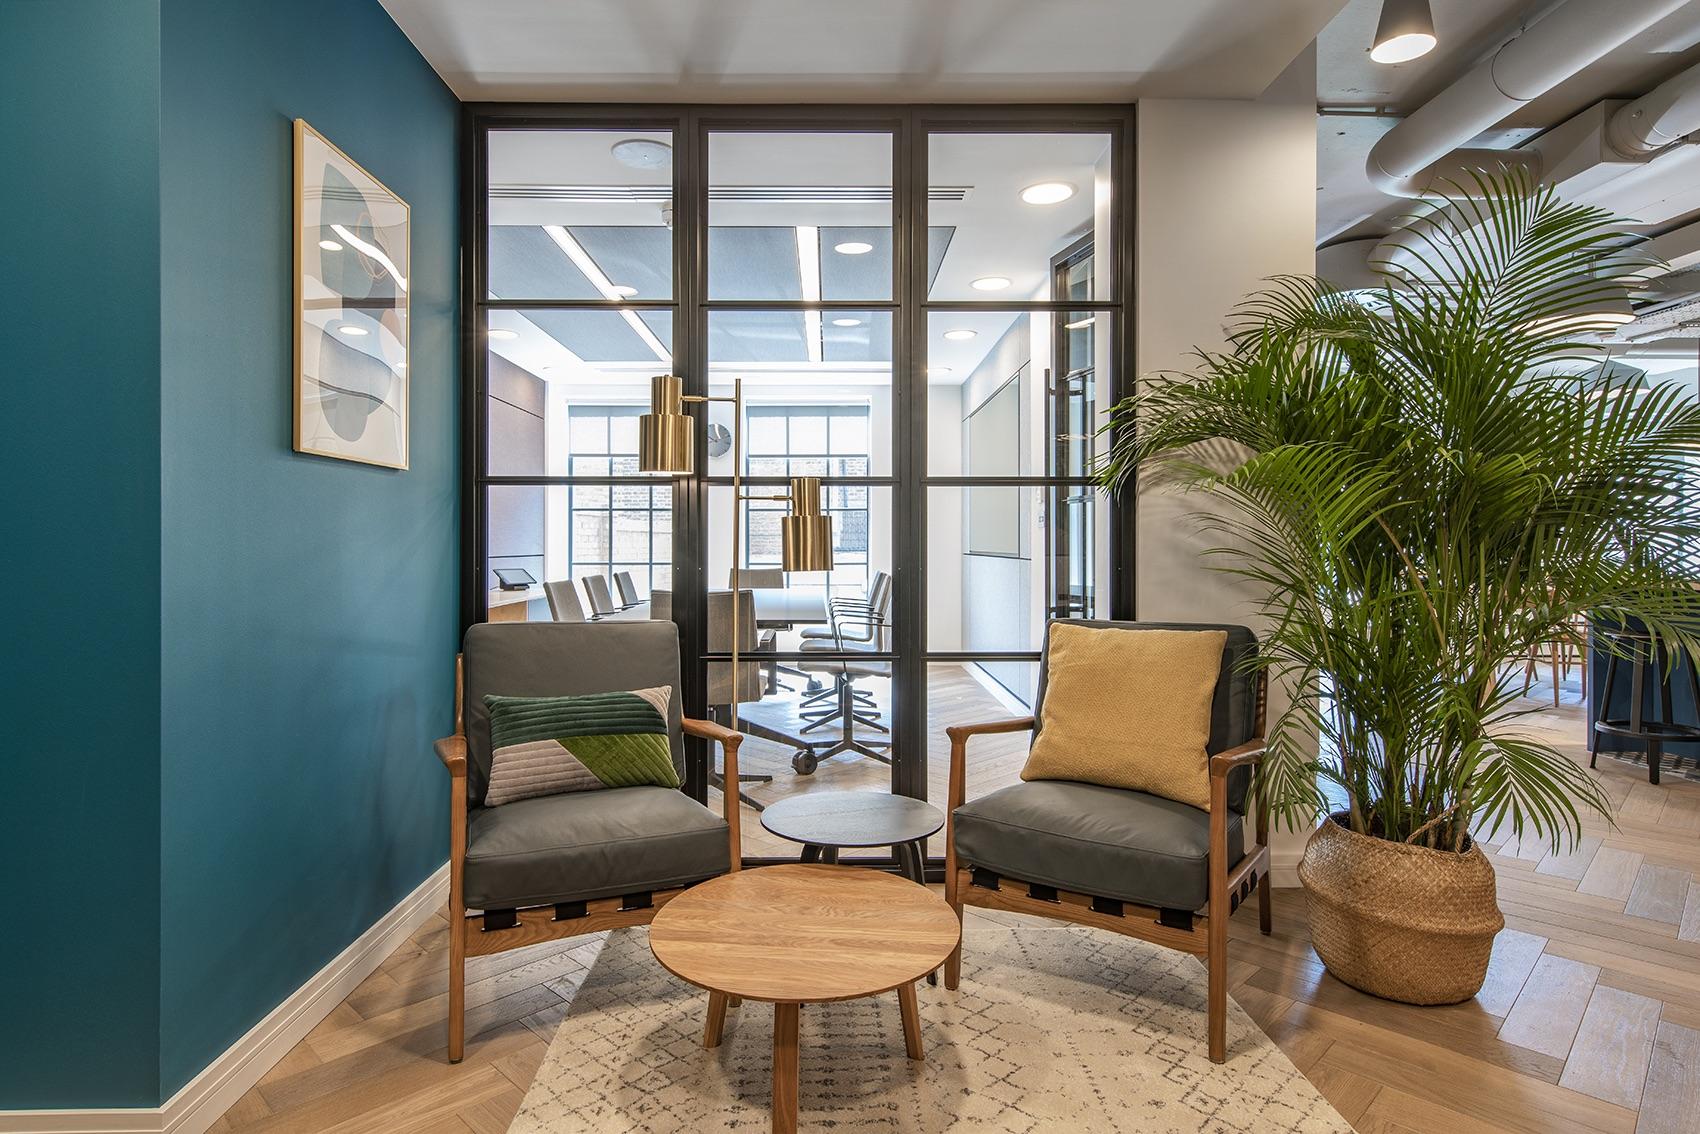 peldon-rose-new-office-london-2